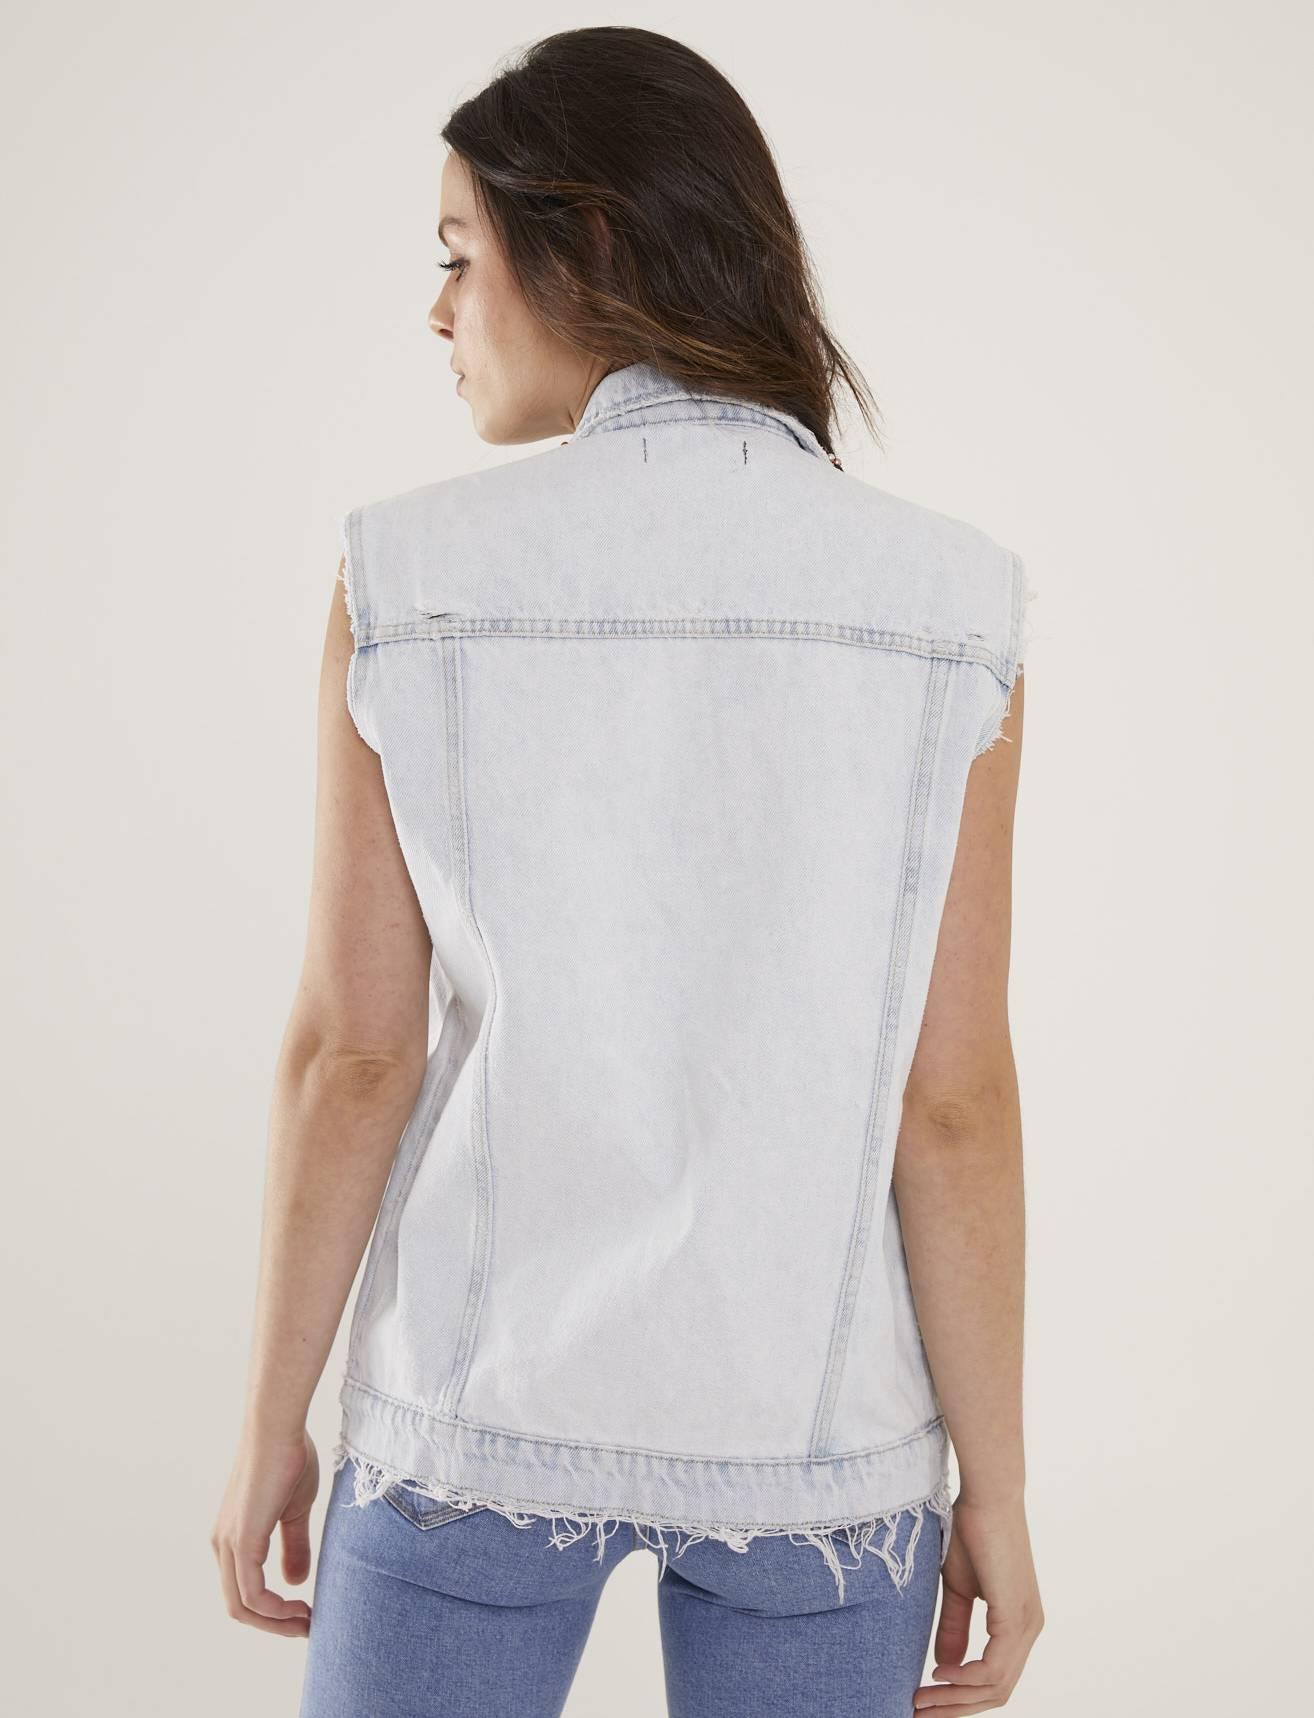 Colete Jeans Feminino Bordado Atelier Turmalina